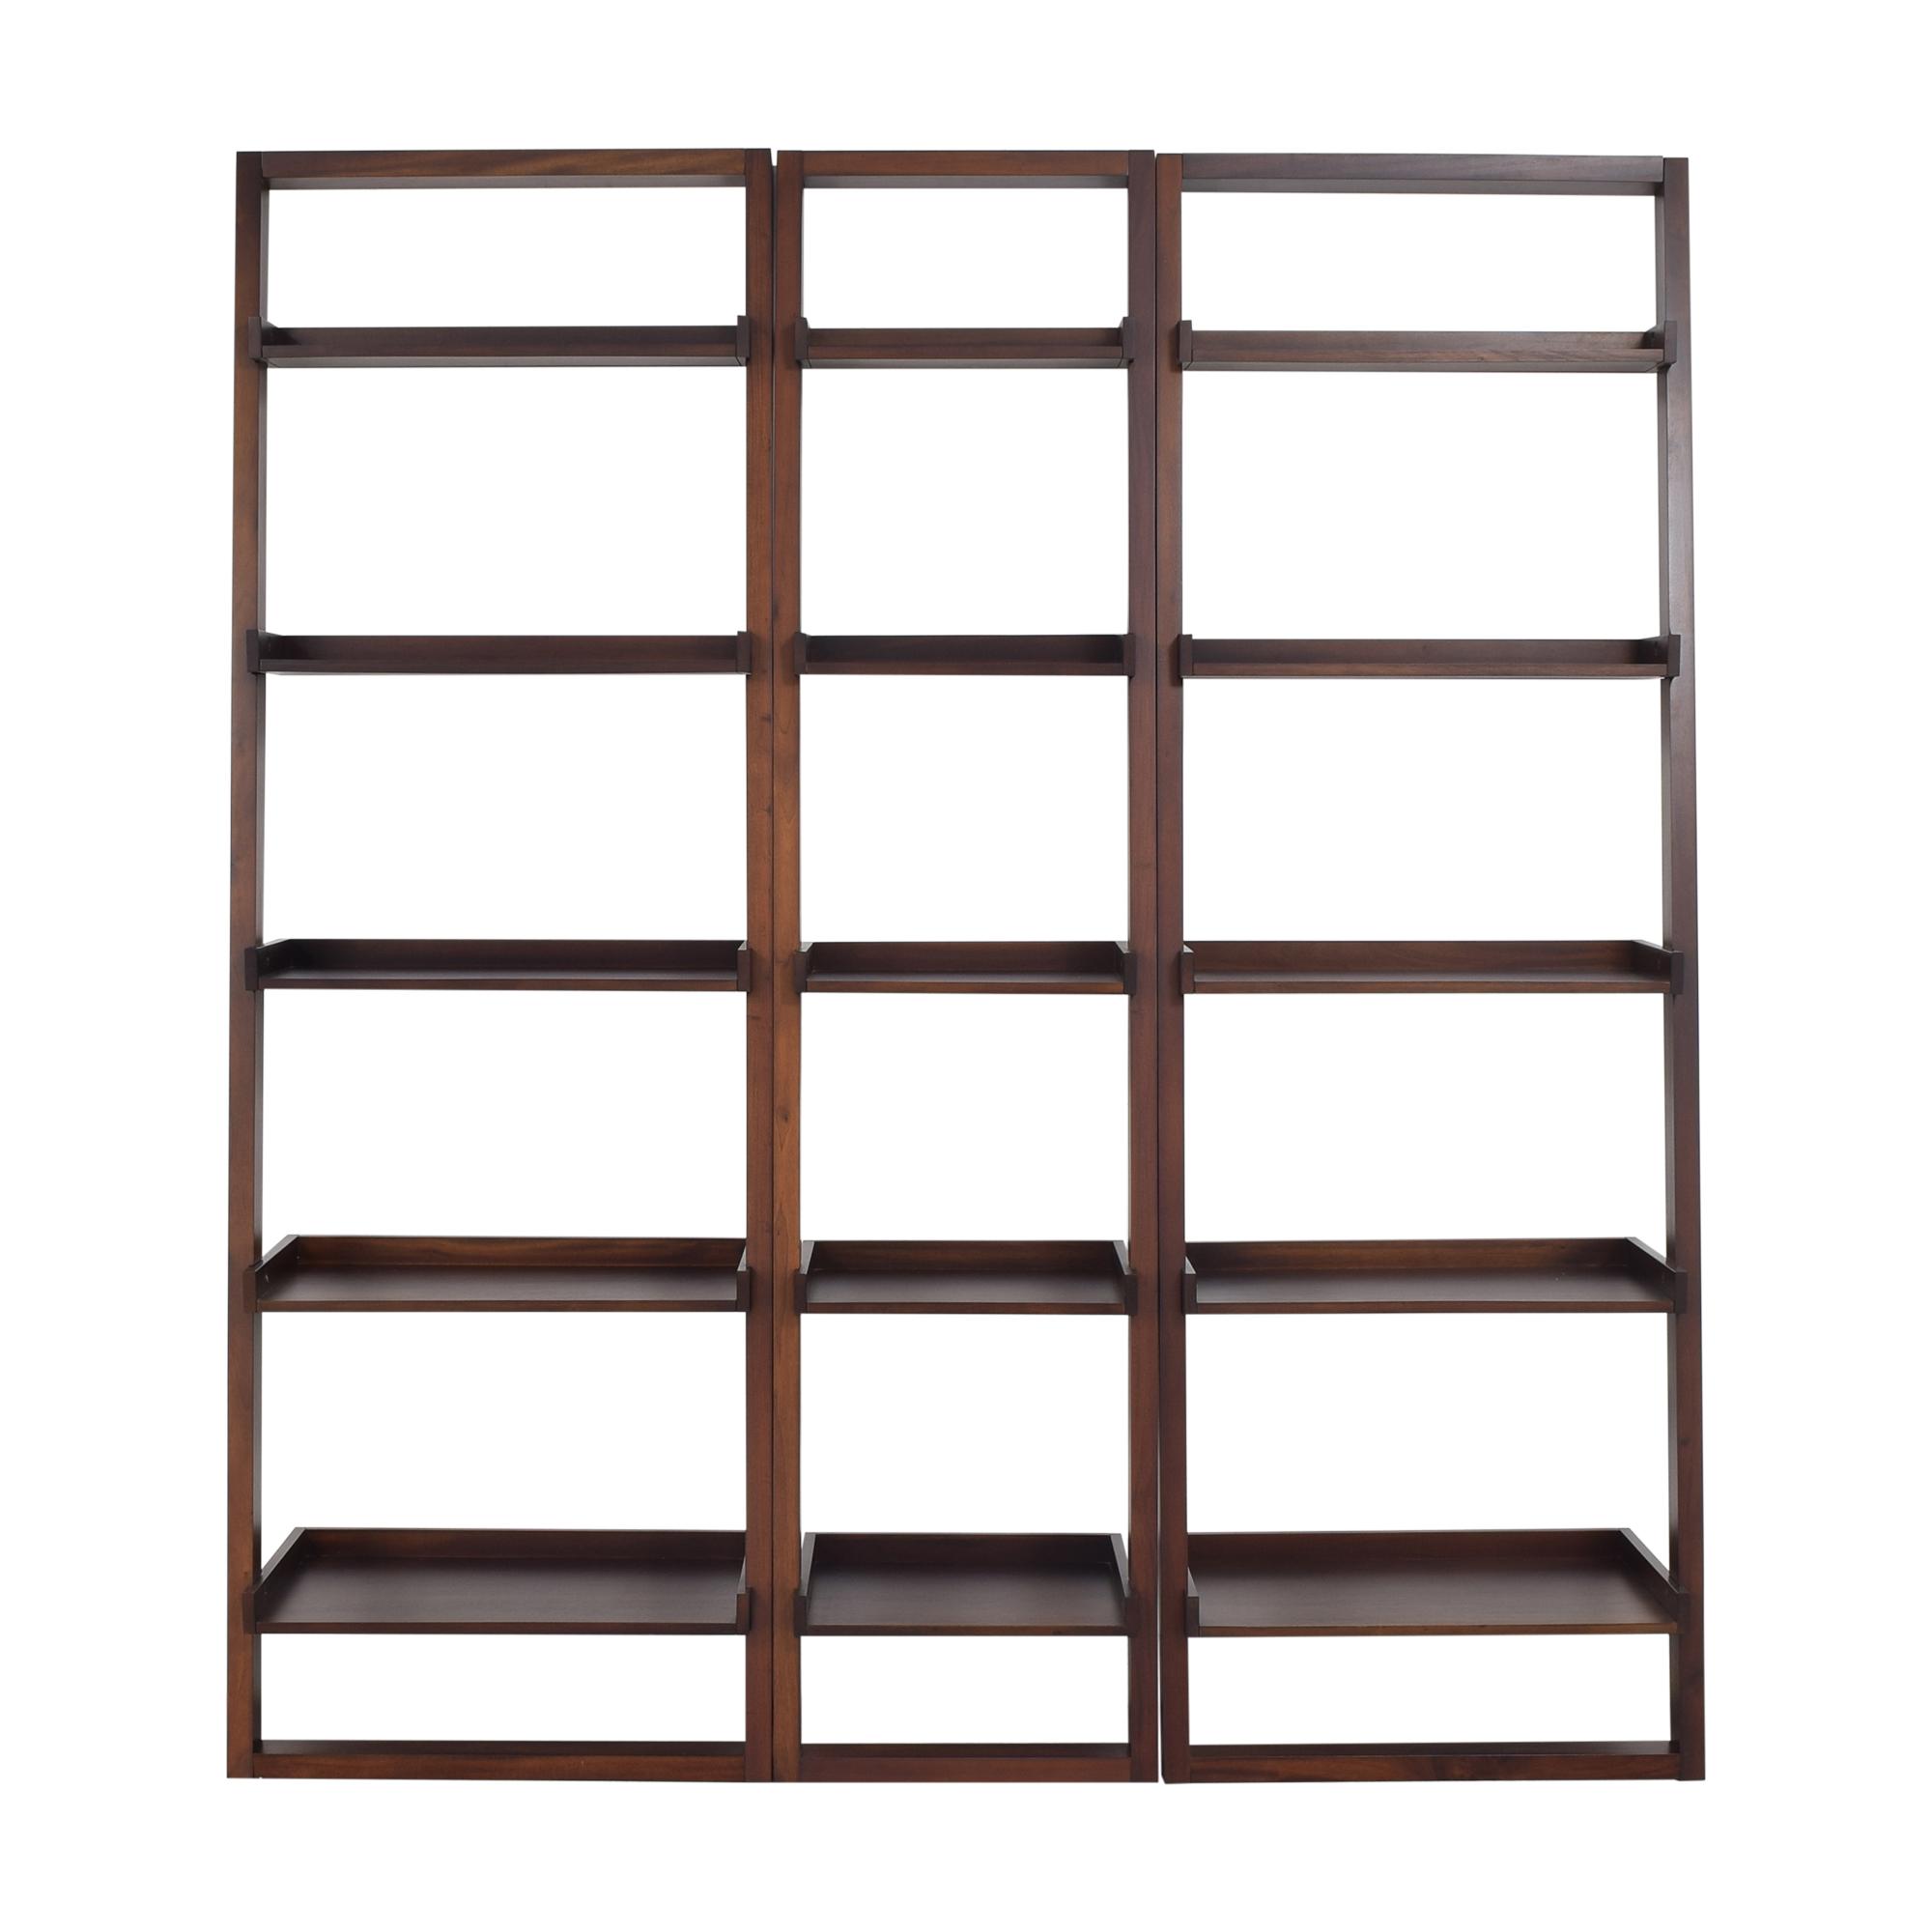 Crate & Barrel Crate & Barrel Sloan Leaning Shelves dark brown